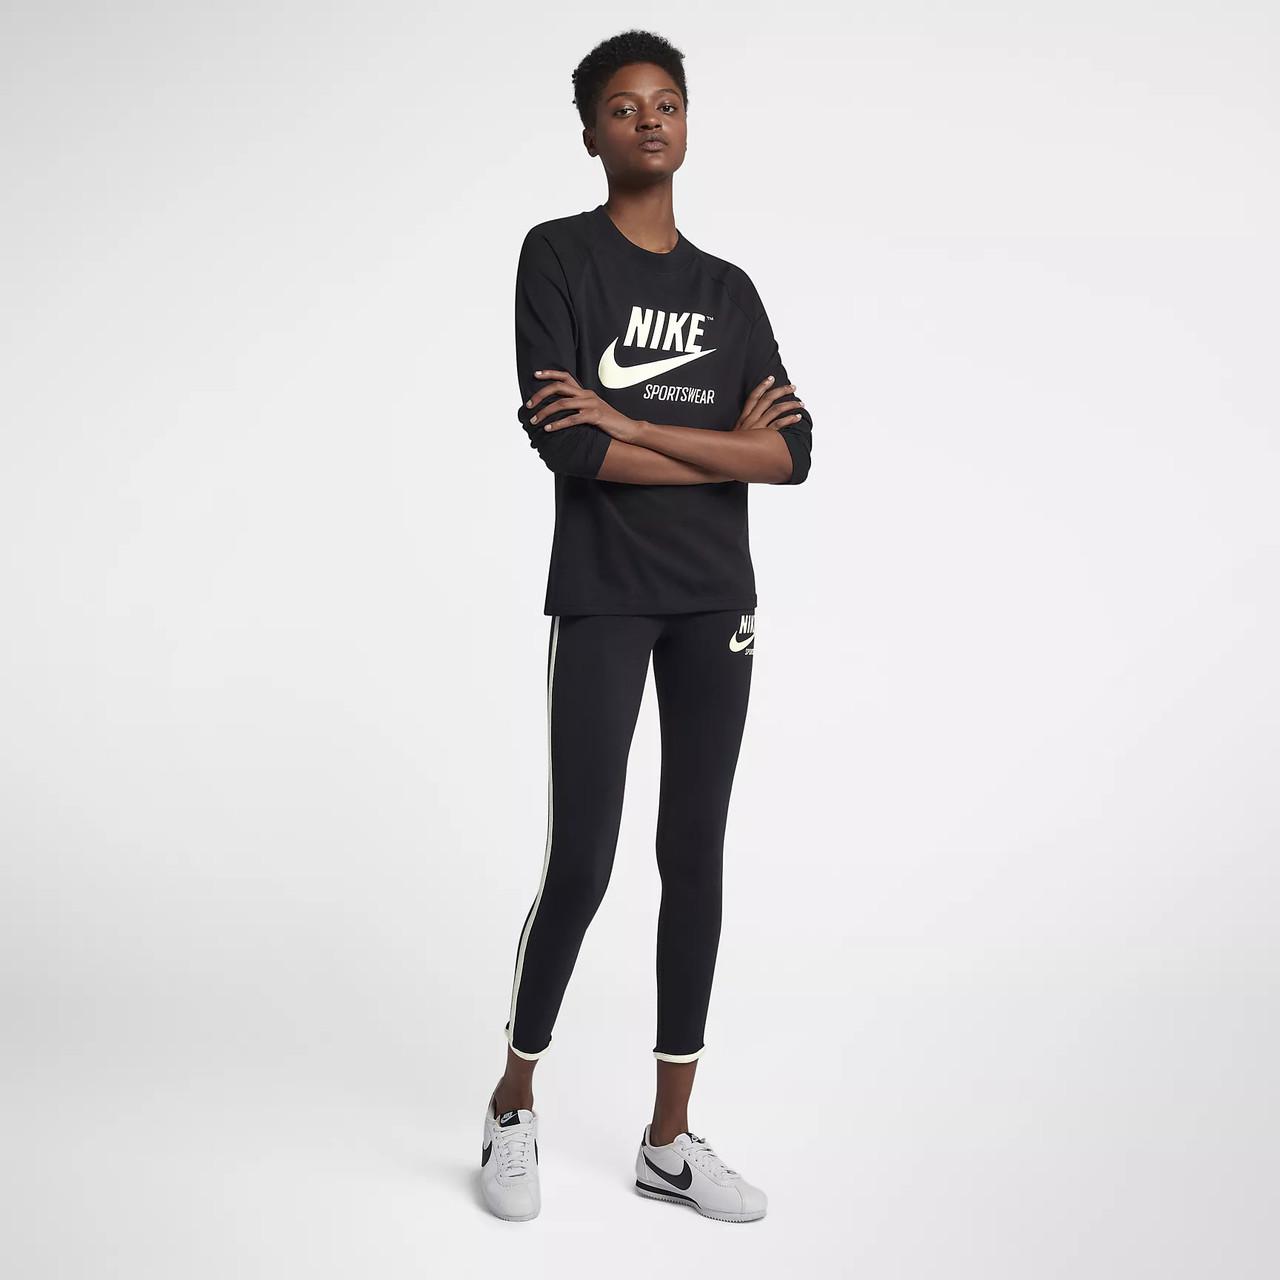 27766abf Женская Толстовка Nike Sportswear Long Sleeve Tee 883521-010 (Оригинал),  цена 989,10 грн., купить в Киеве — Prom.ua (ID#721063106)